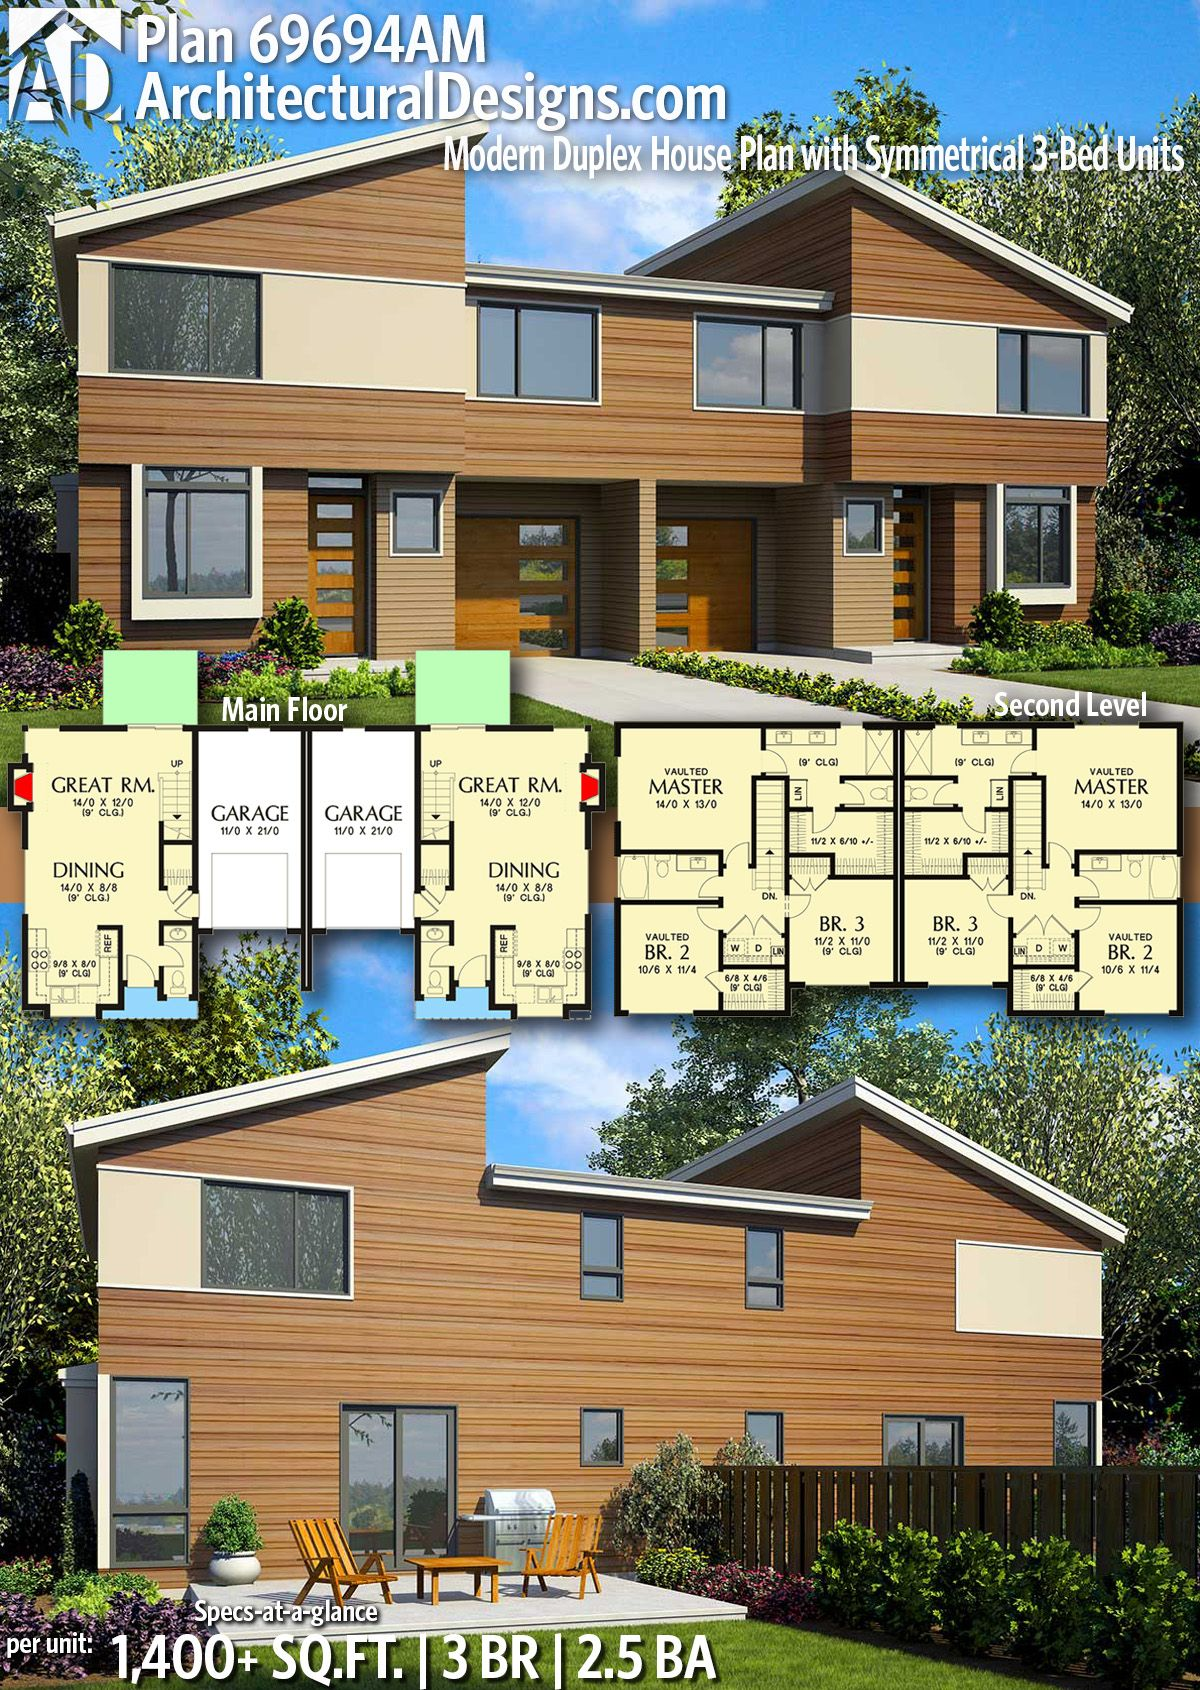 Plan 69694am Modern Duplex House Plan With Symmetrical 3 Bed Units Duplex House Plans House Plans Industrial House Exterior